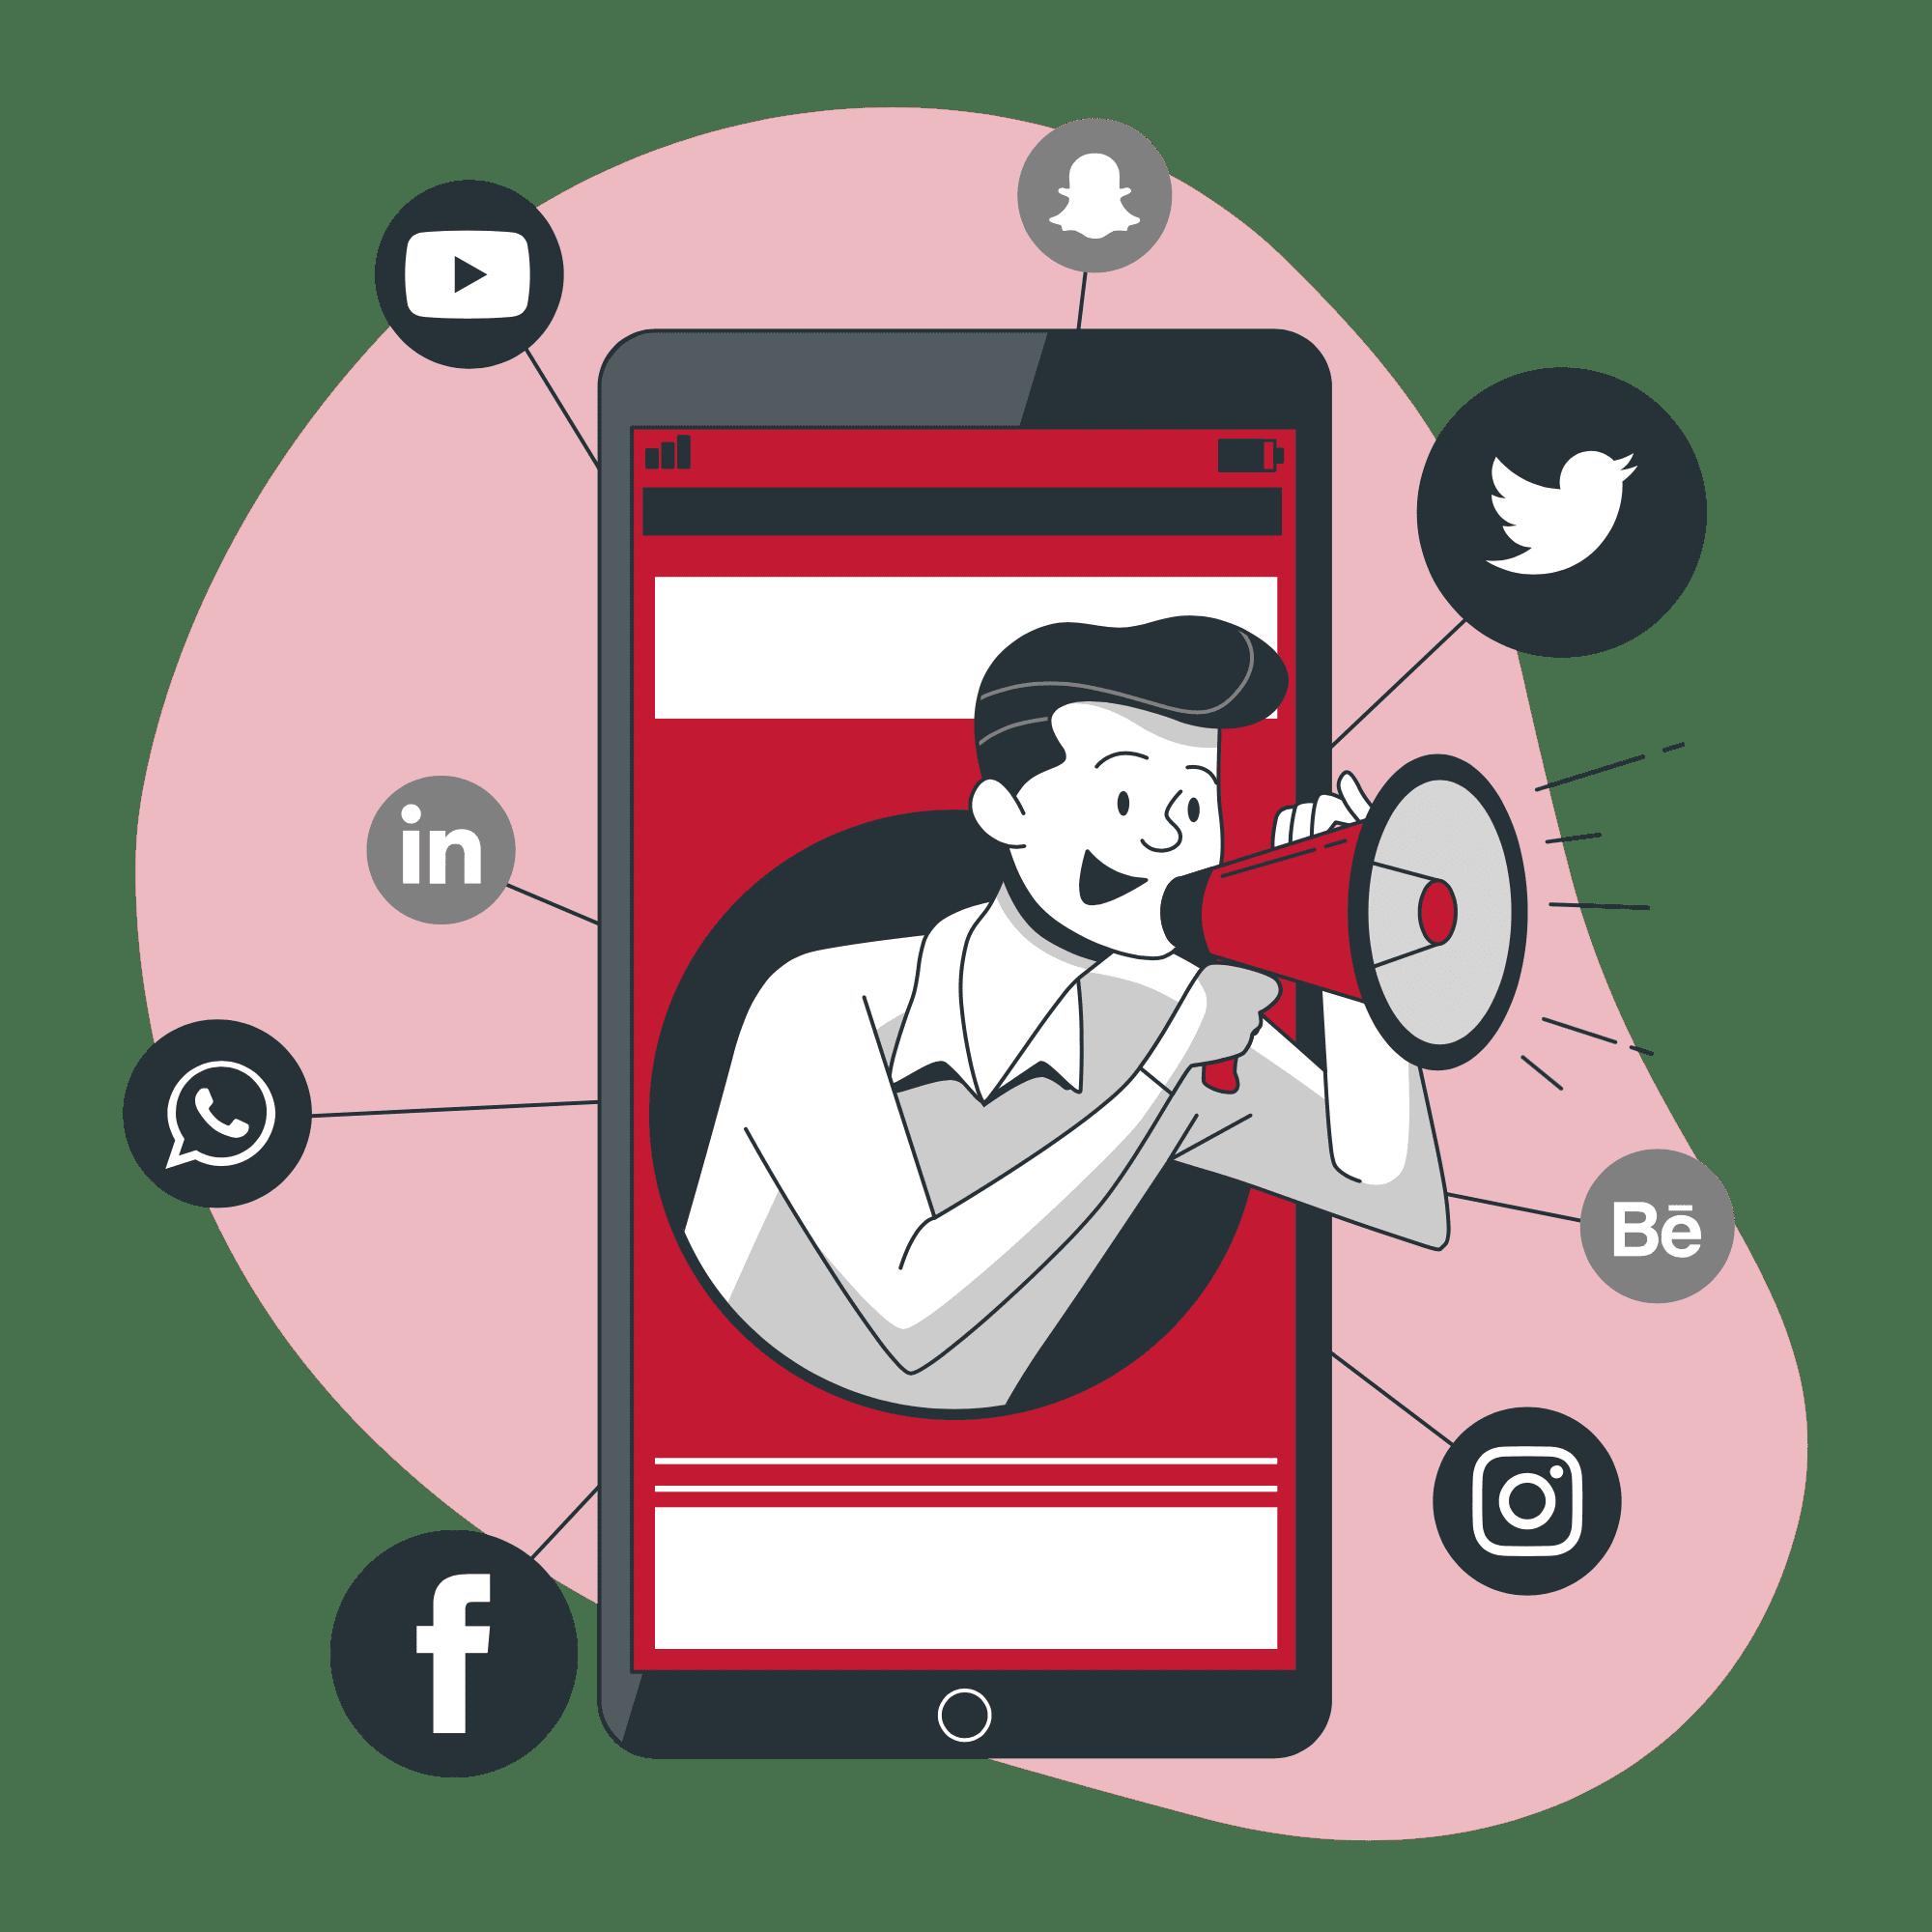 Mis redes sociales favoritas - Alt Solutions Blog